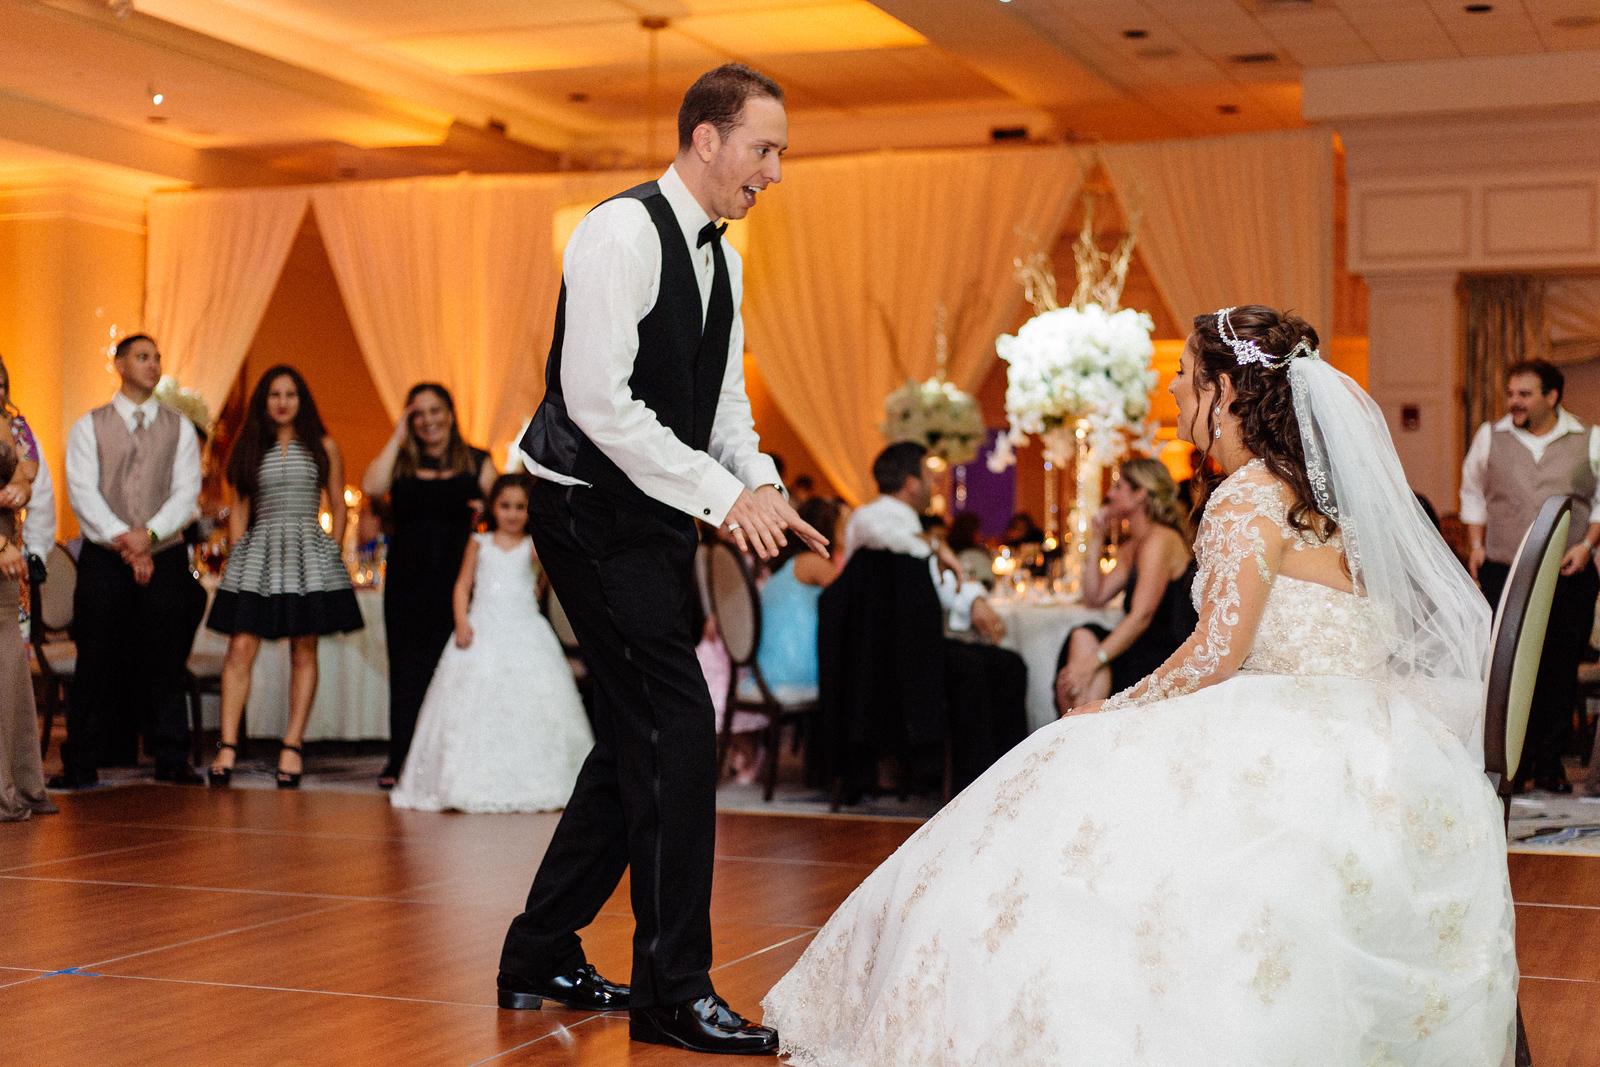 South-Florida-Wedding-Photographer-Andreo-5D3_5426